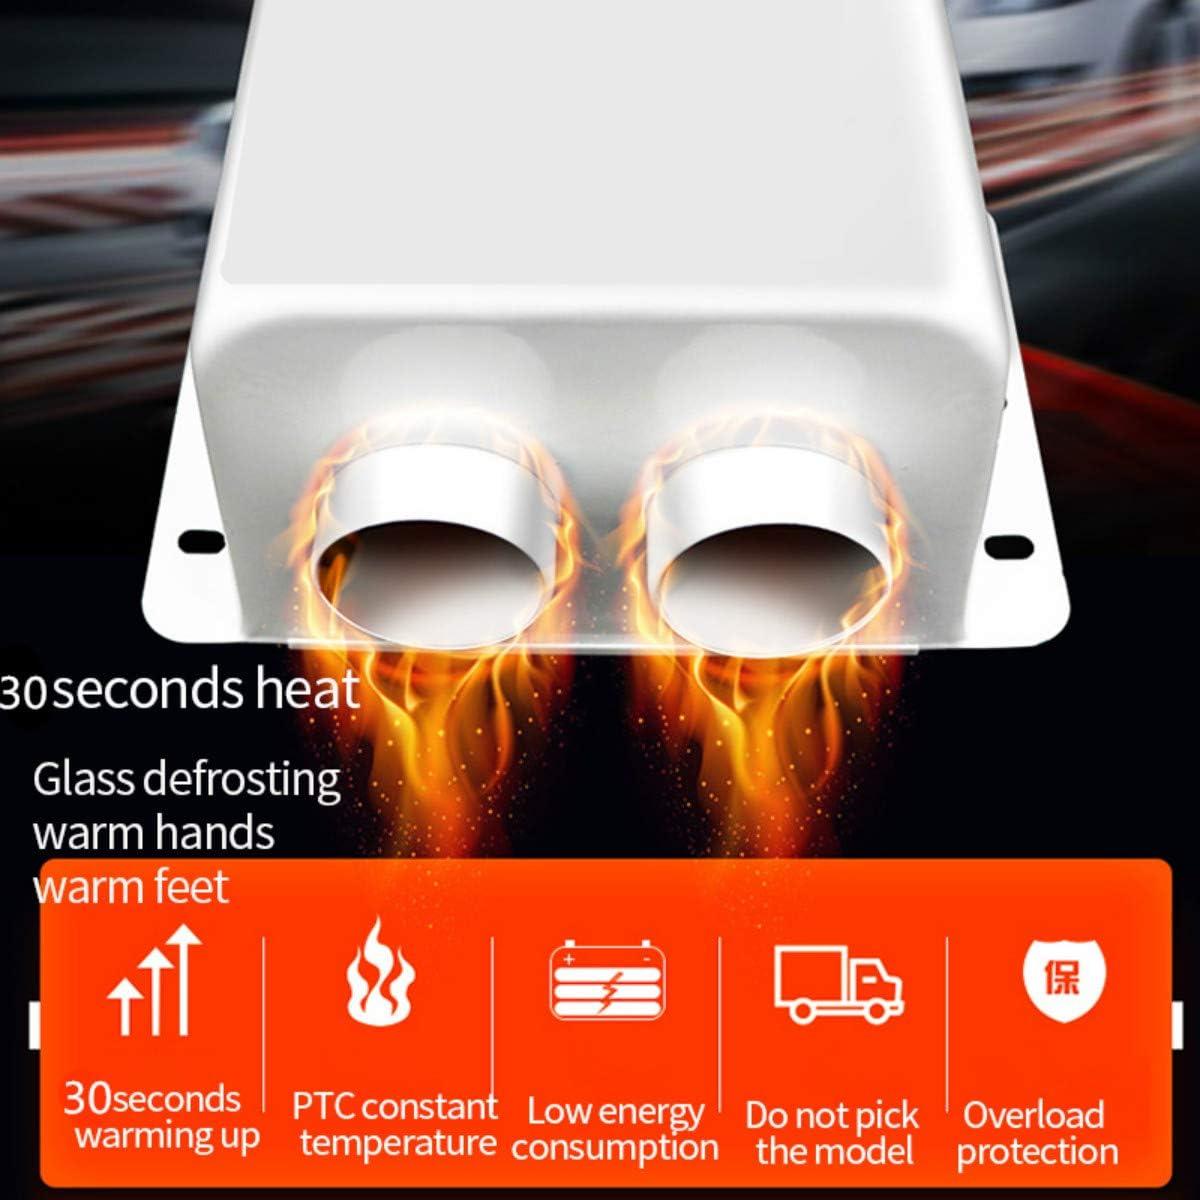 Portable Car Fan Heater 24V Car Heater 600W 2 Holes Heated Fan Heaters Windshield Defroster Demister For Glasses